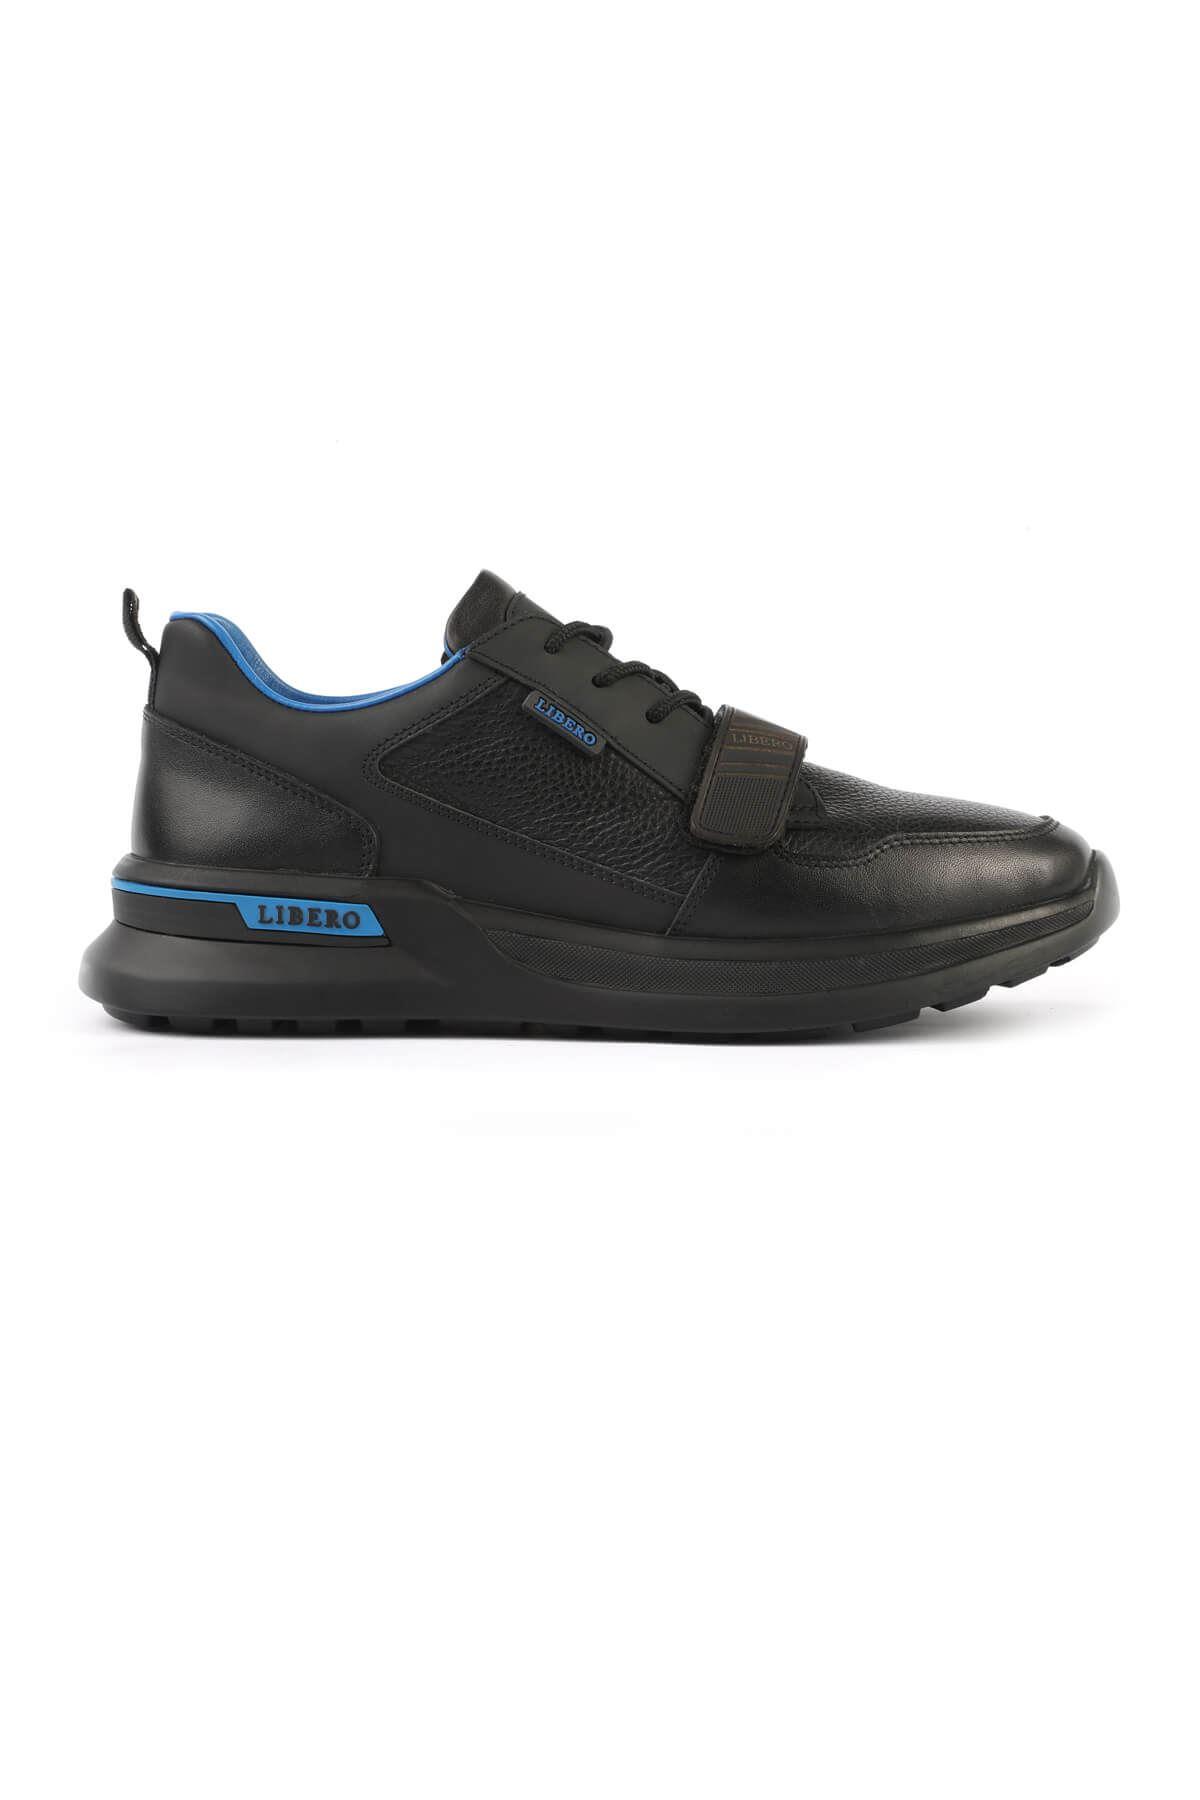 Libero 3141 Siyah Mavi Spor Ayakkabı